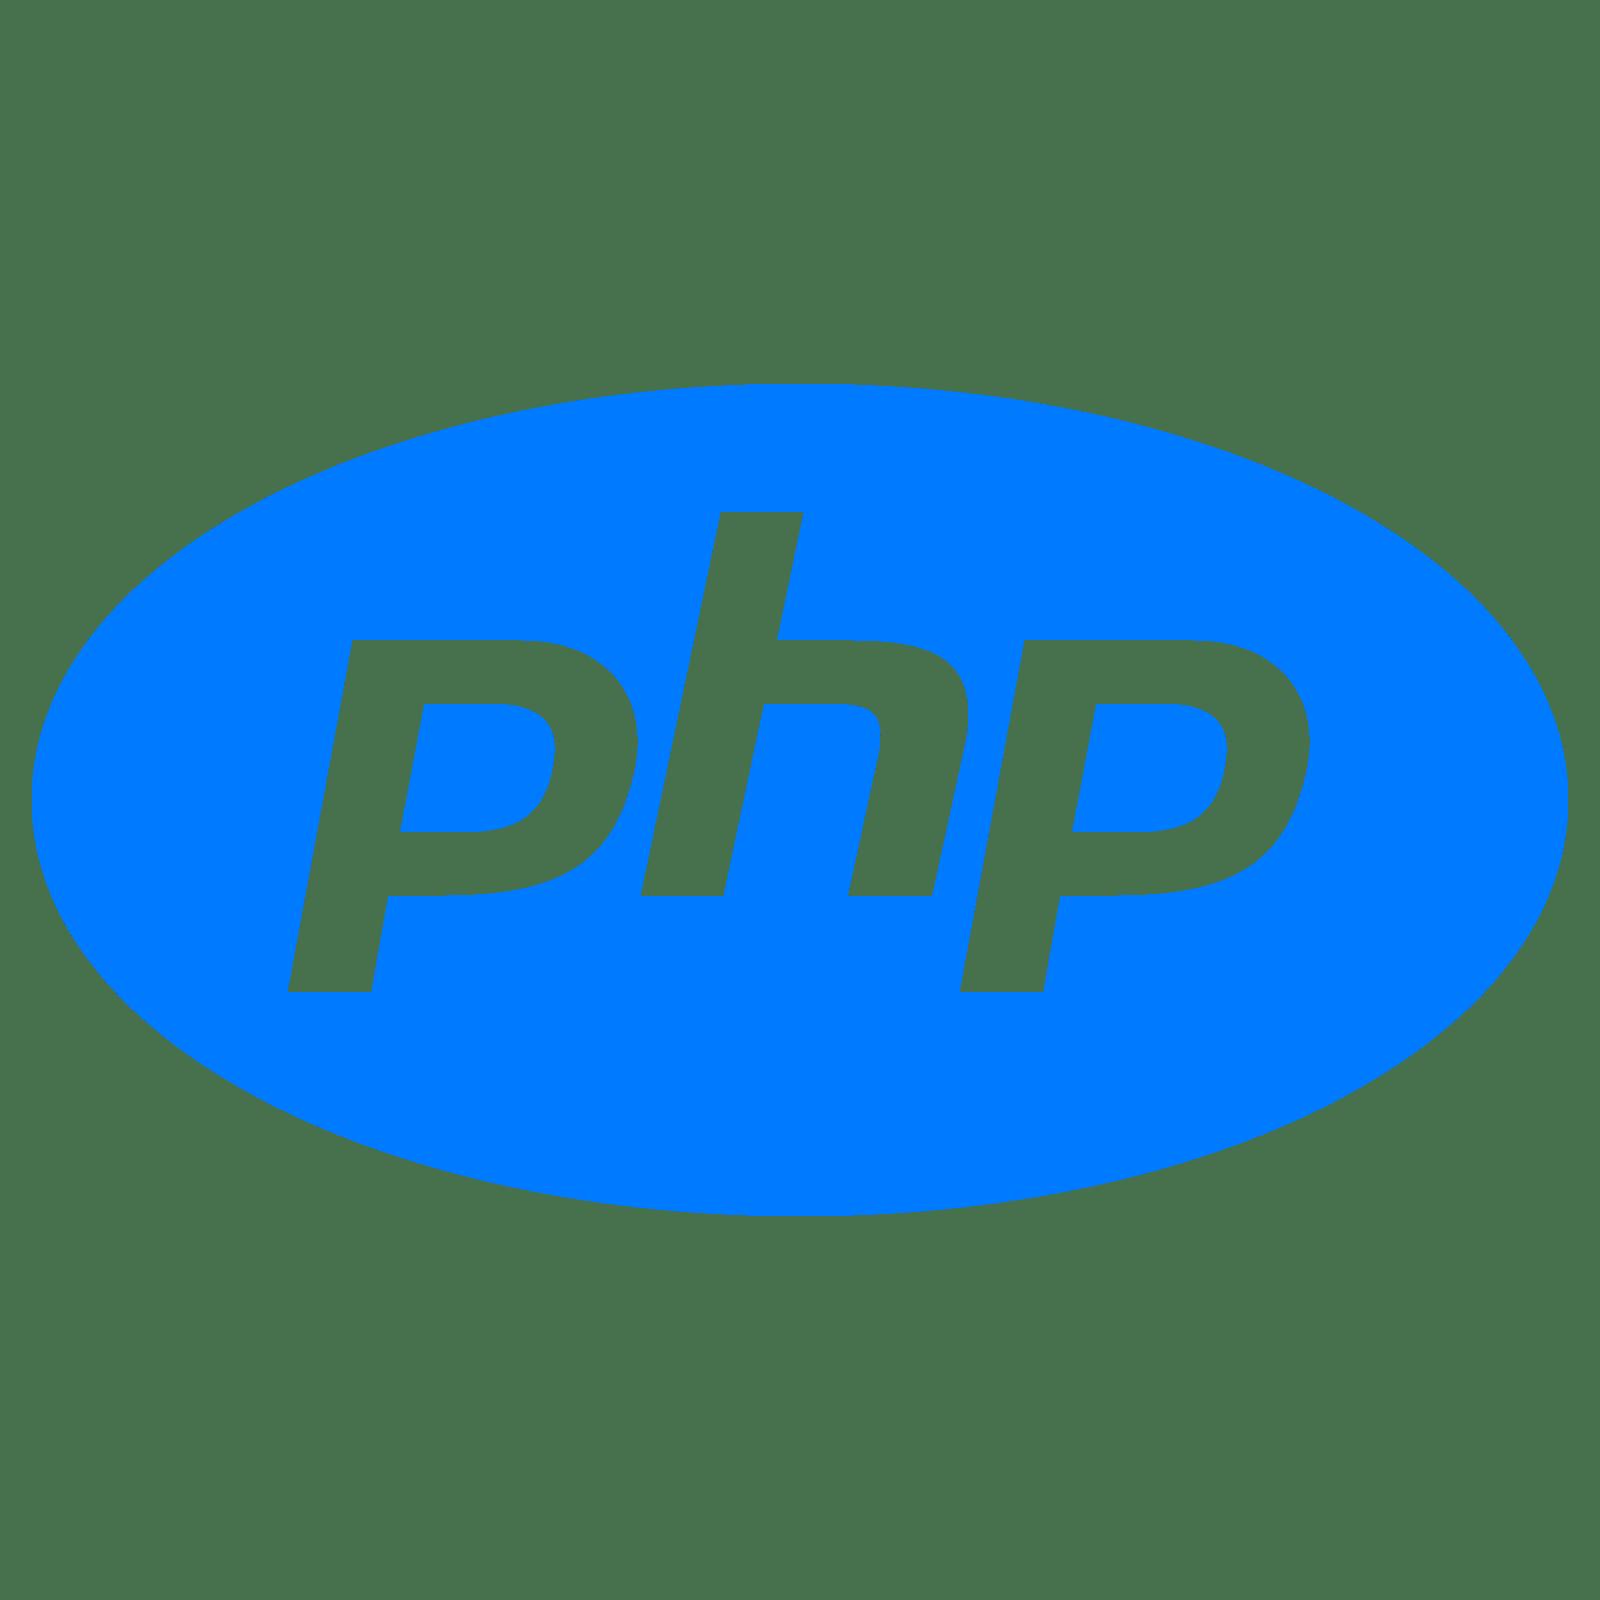 PHP Logo PNG Transparent Images Free Download Clip Art.